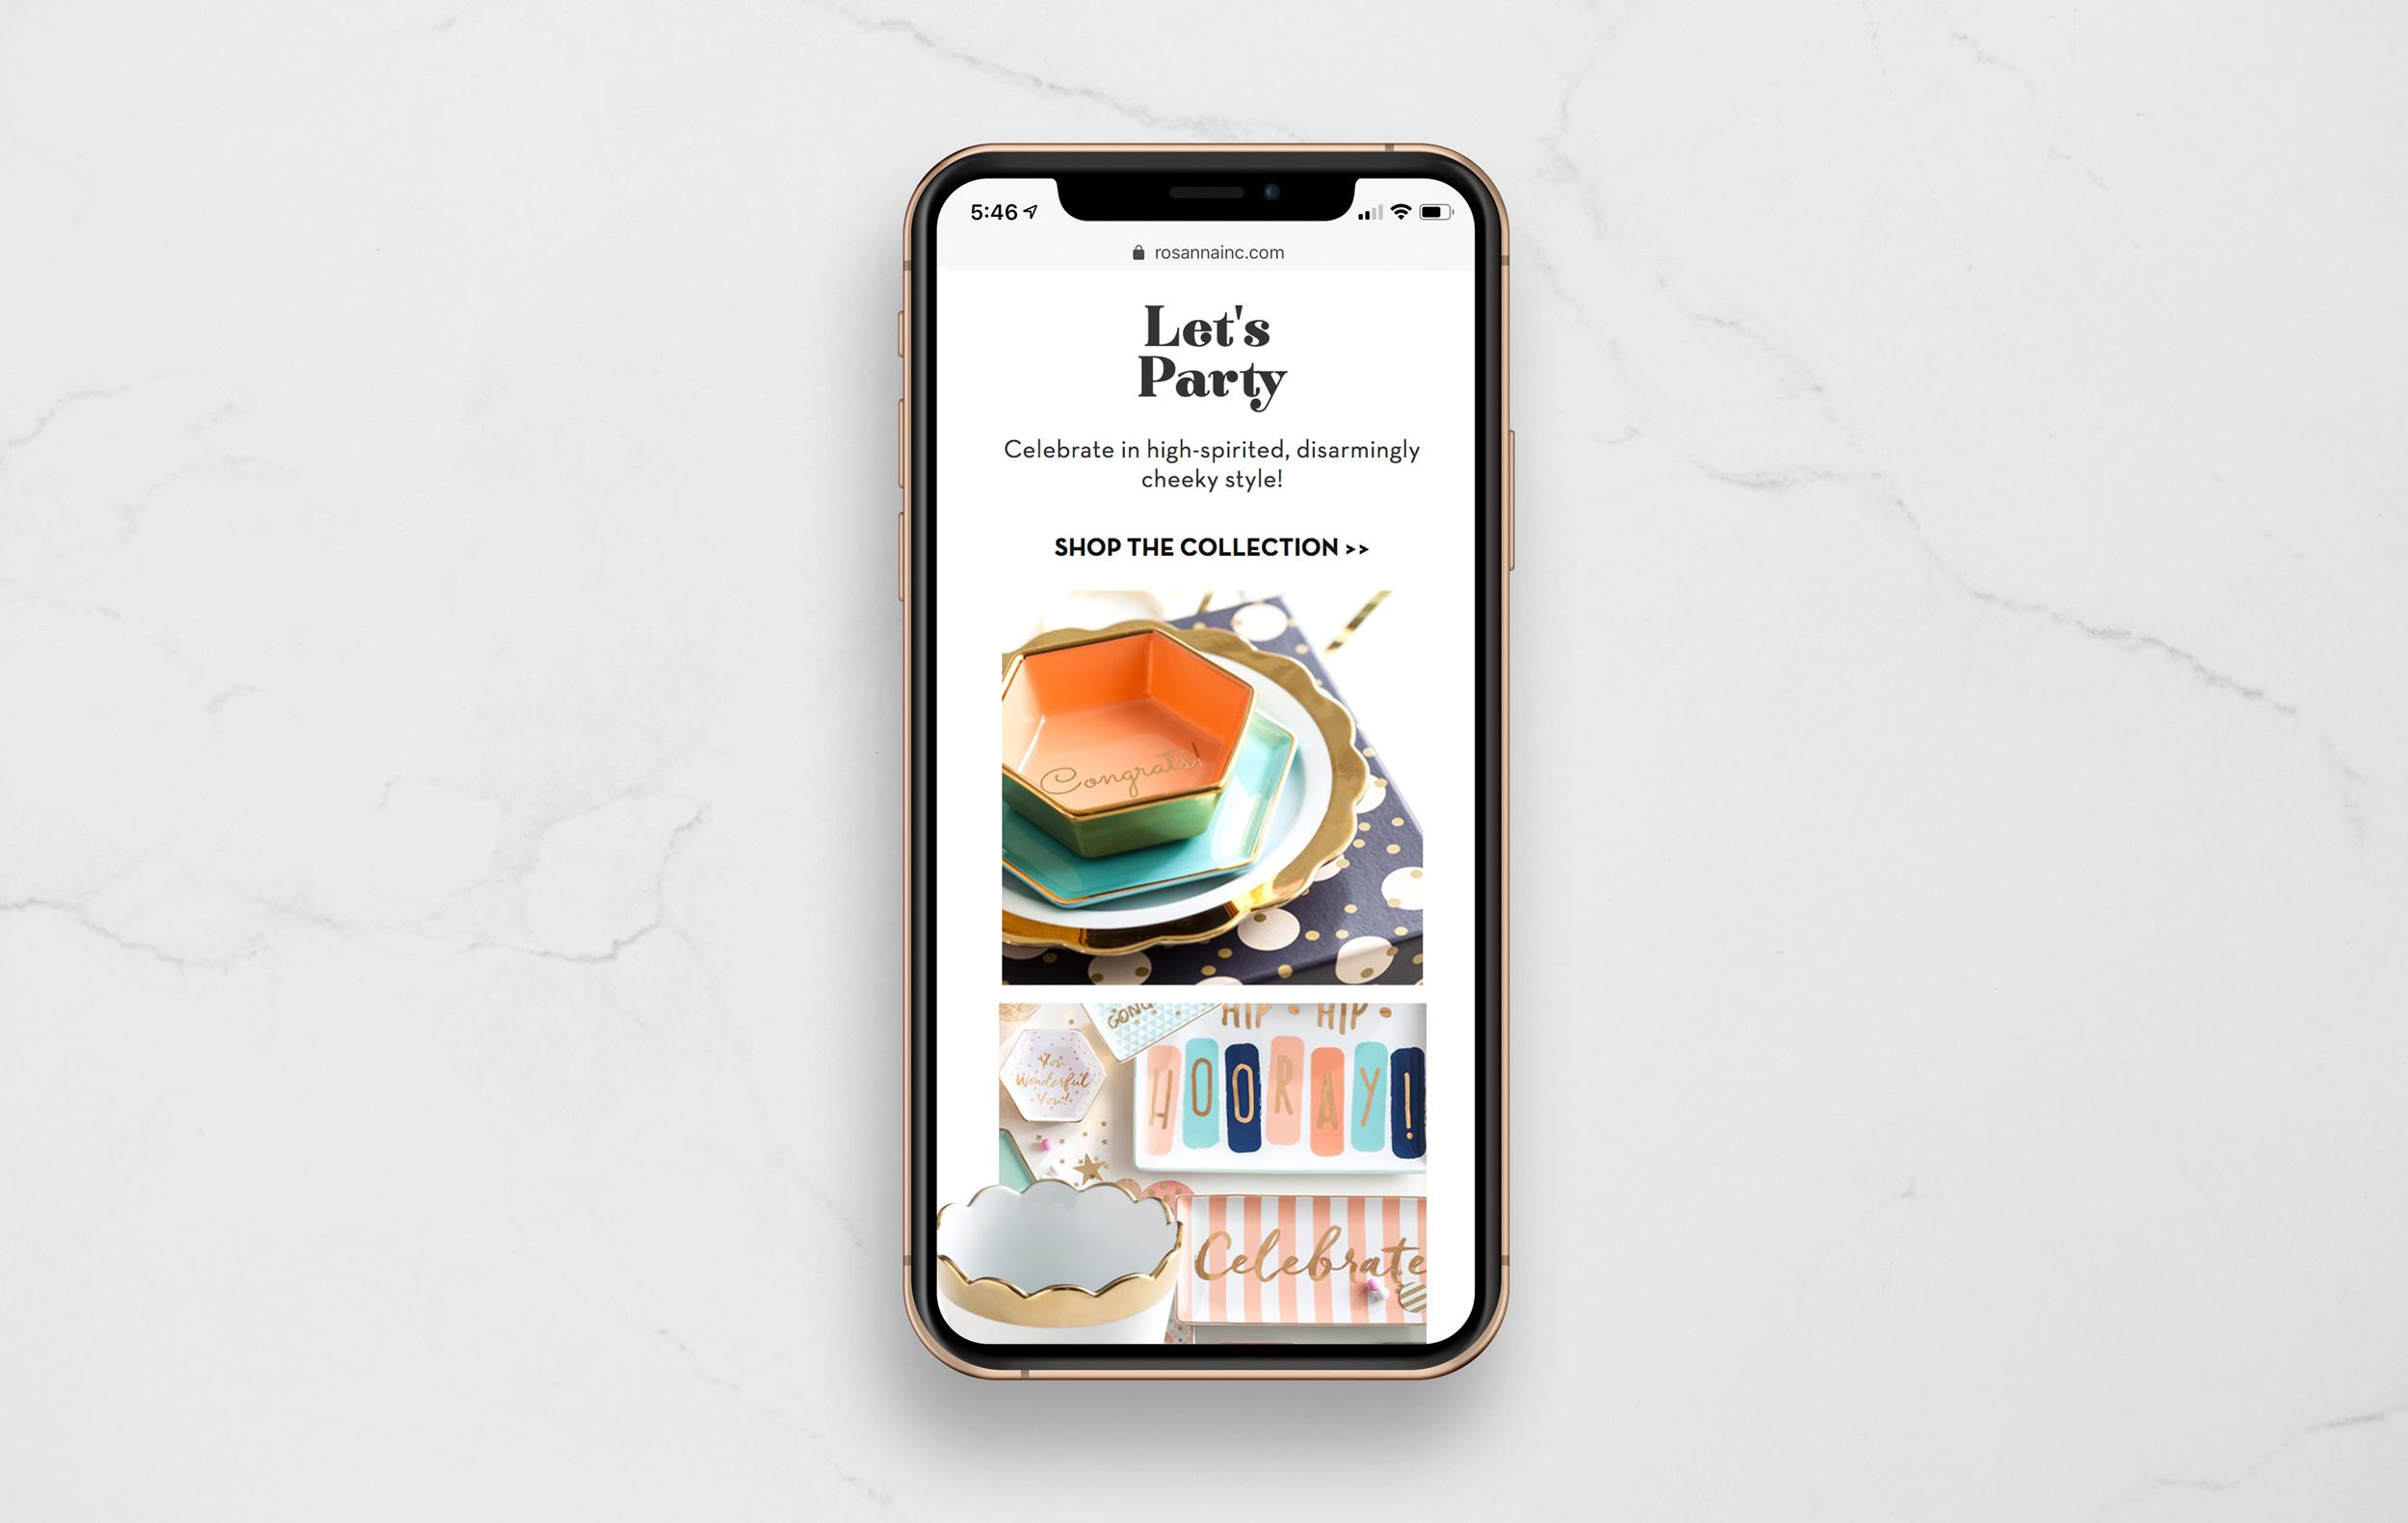 rosanna-website-mobile